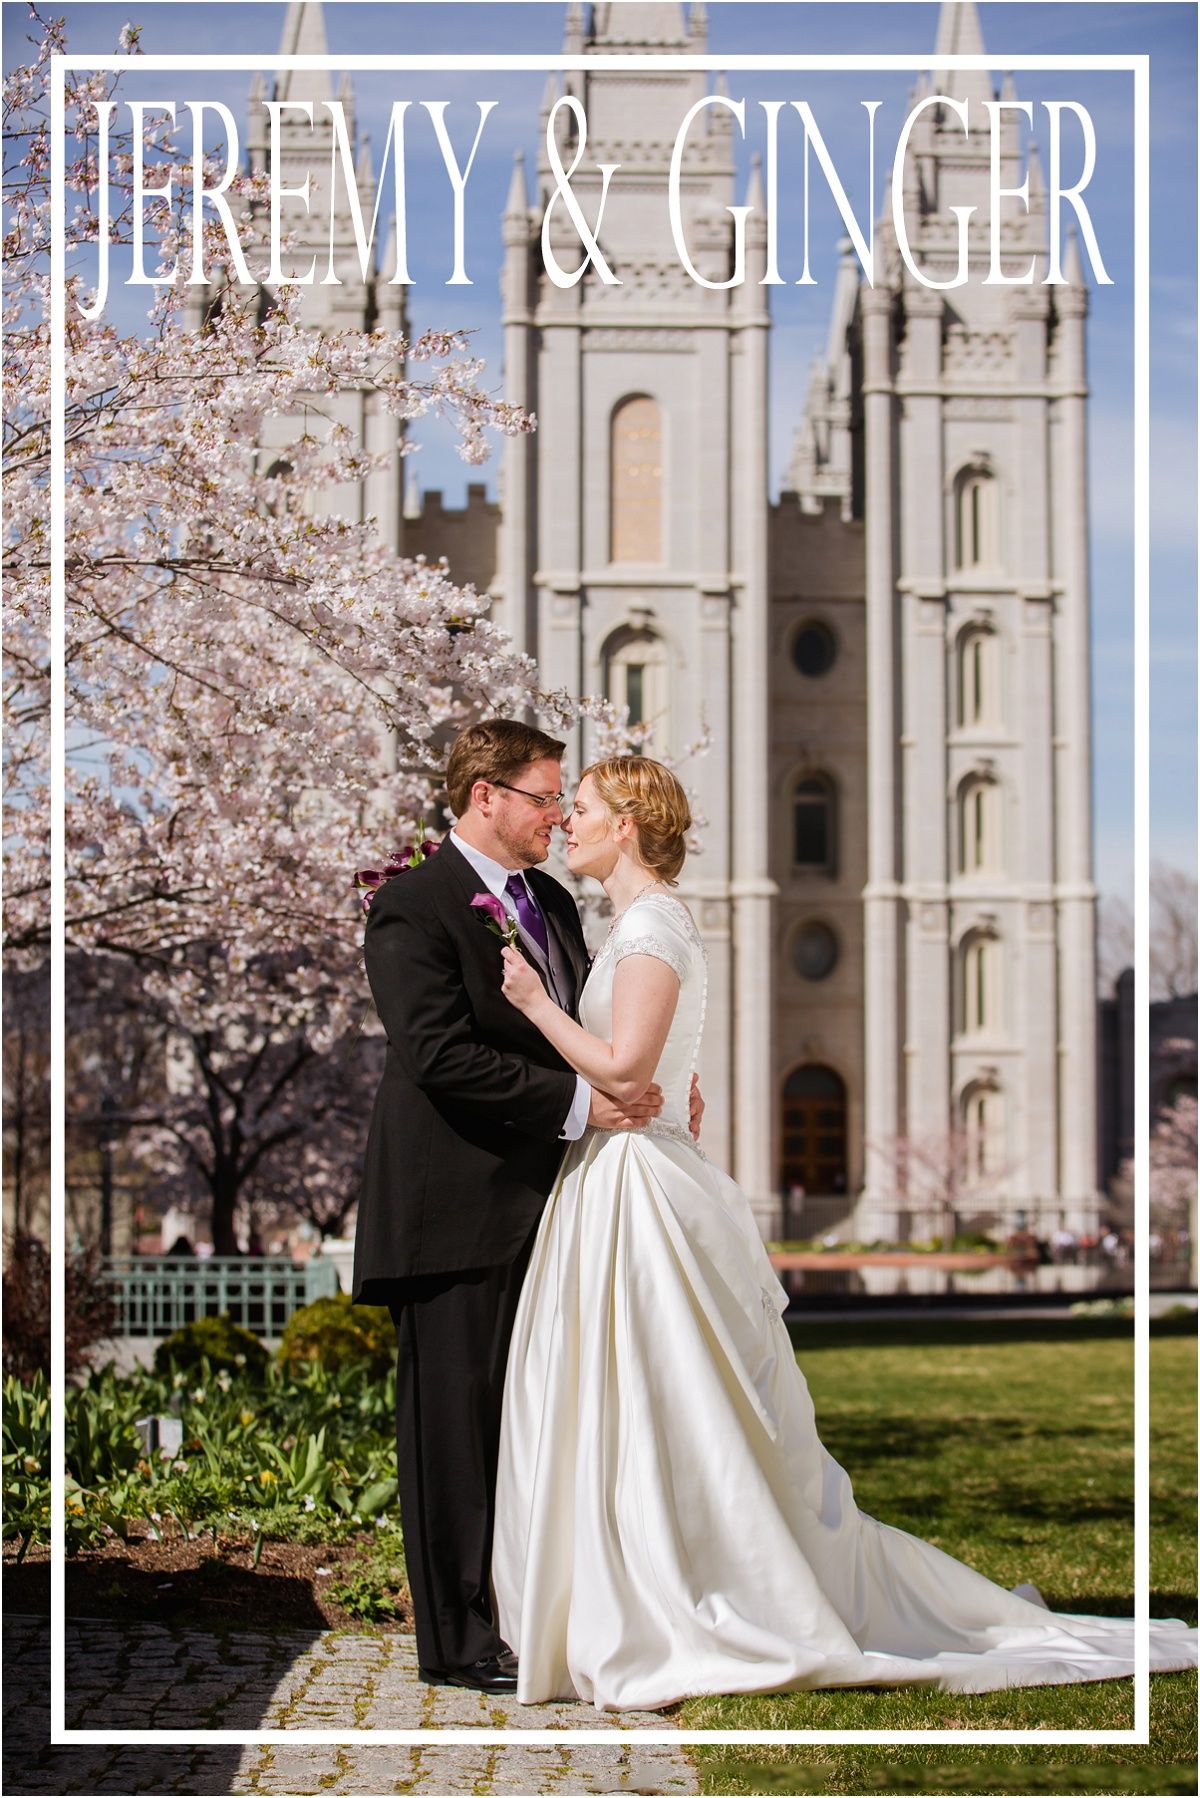 Terra Cooper Photography Weddings Brides 2015_5392.jpg